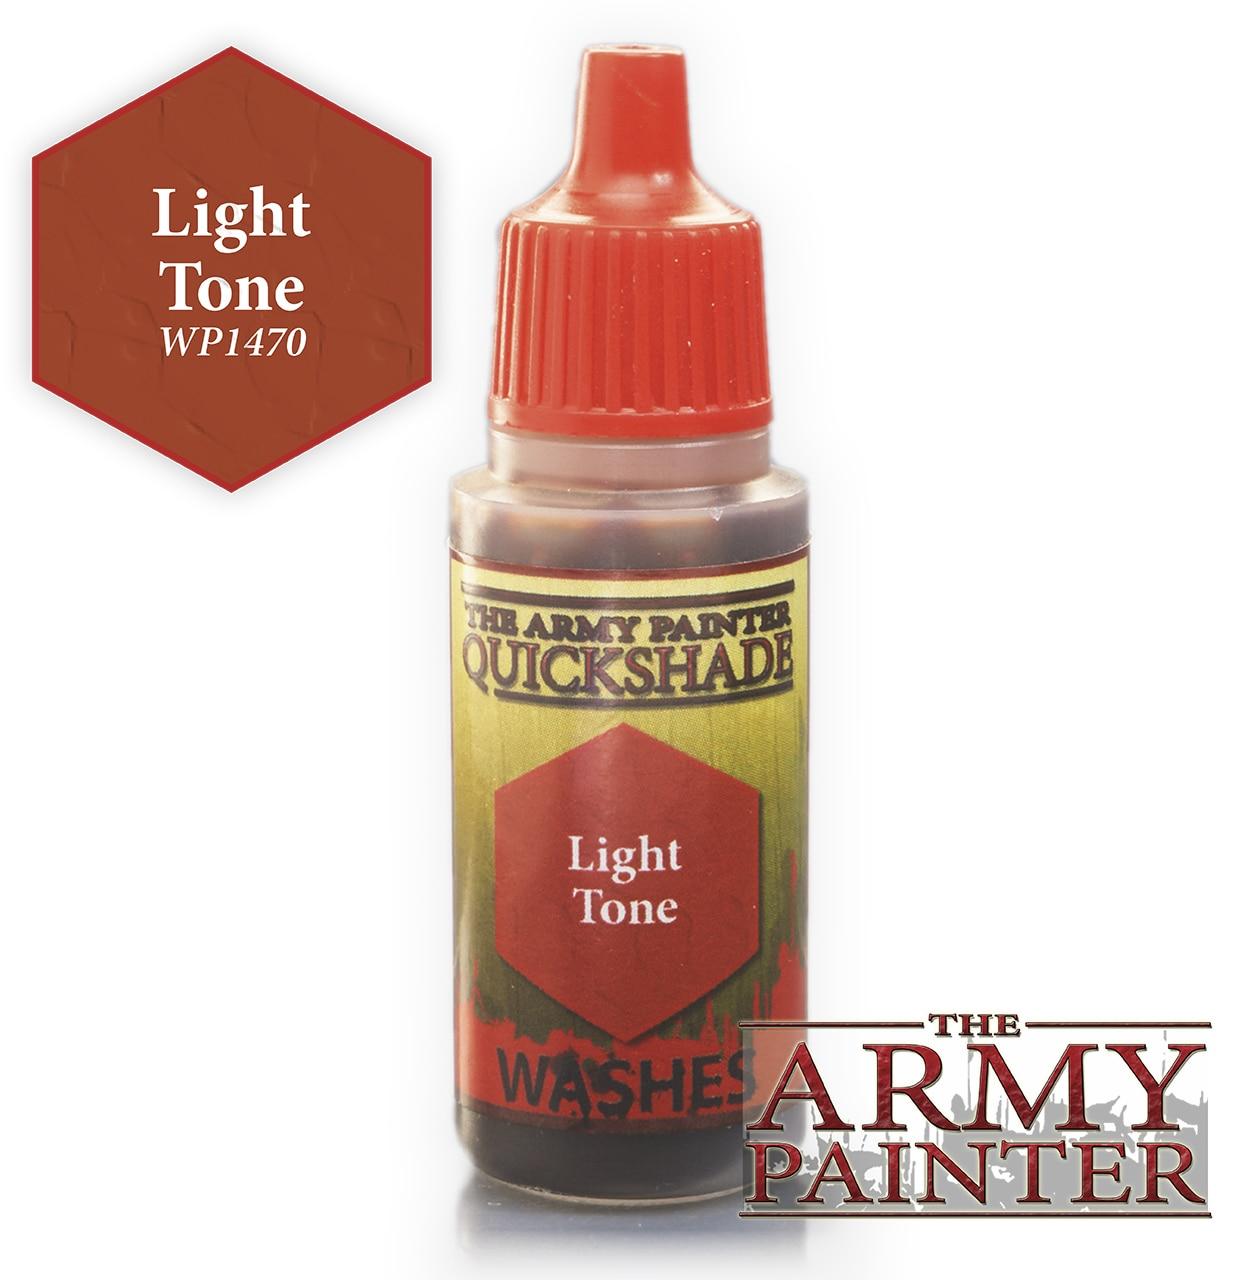 Army Painter Quickshade - Light Tone